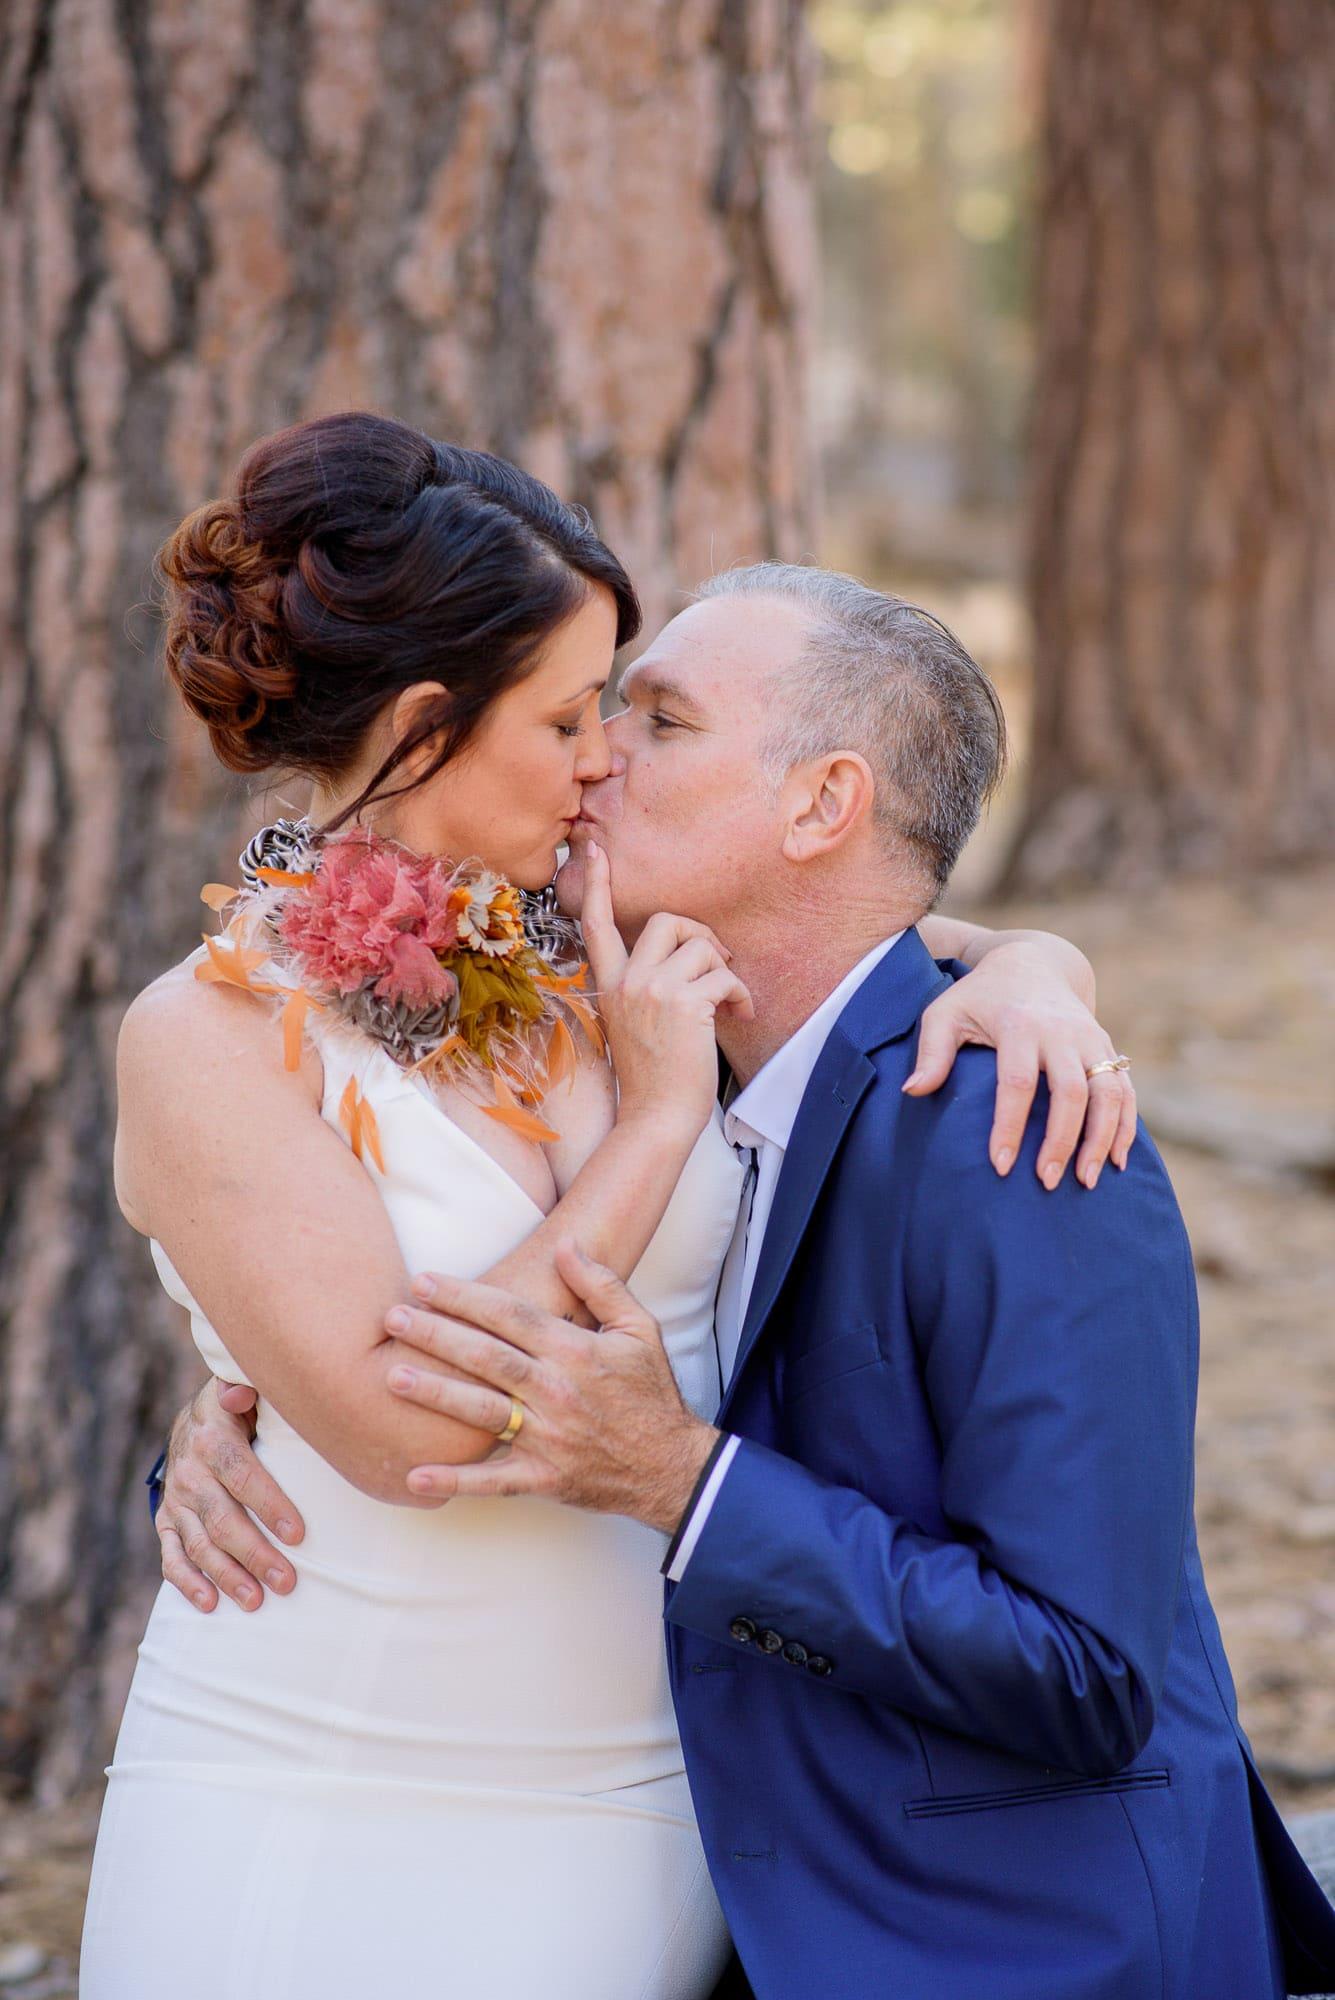 036_Alan_and_Heidi_Palm_Springs_Tram_Wedding